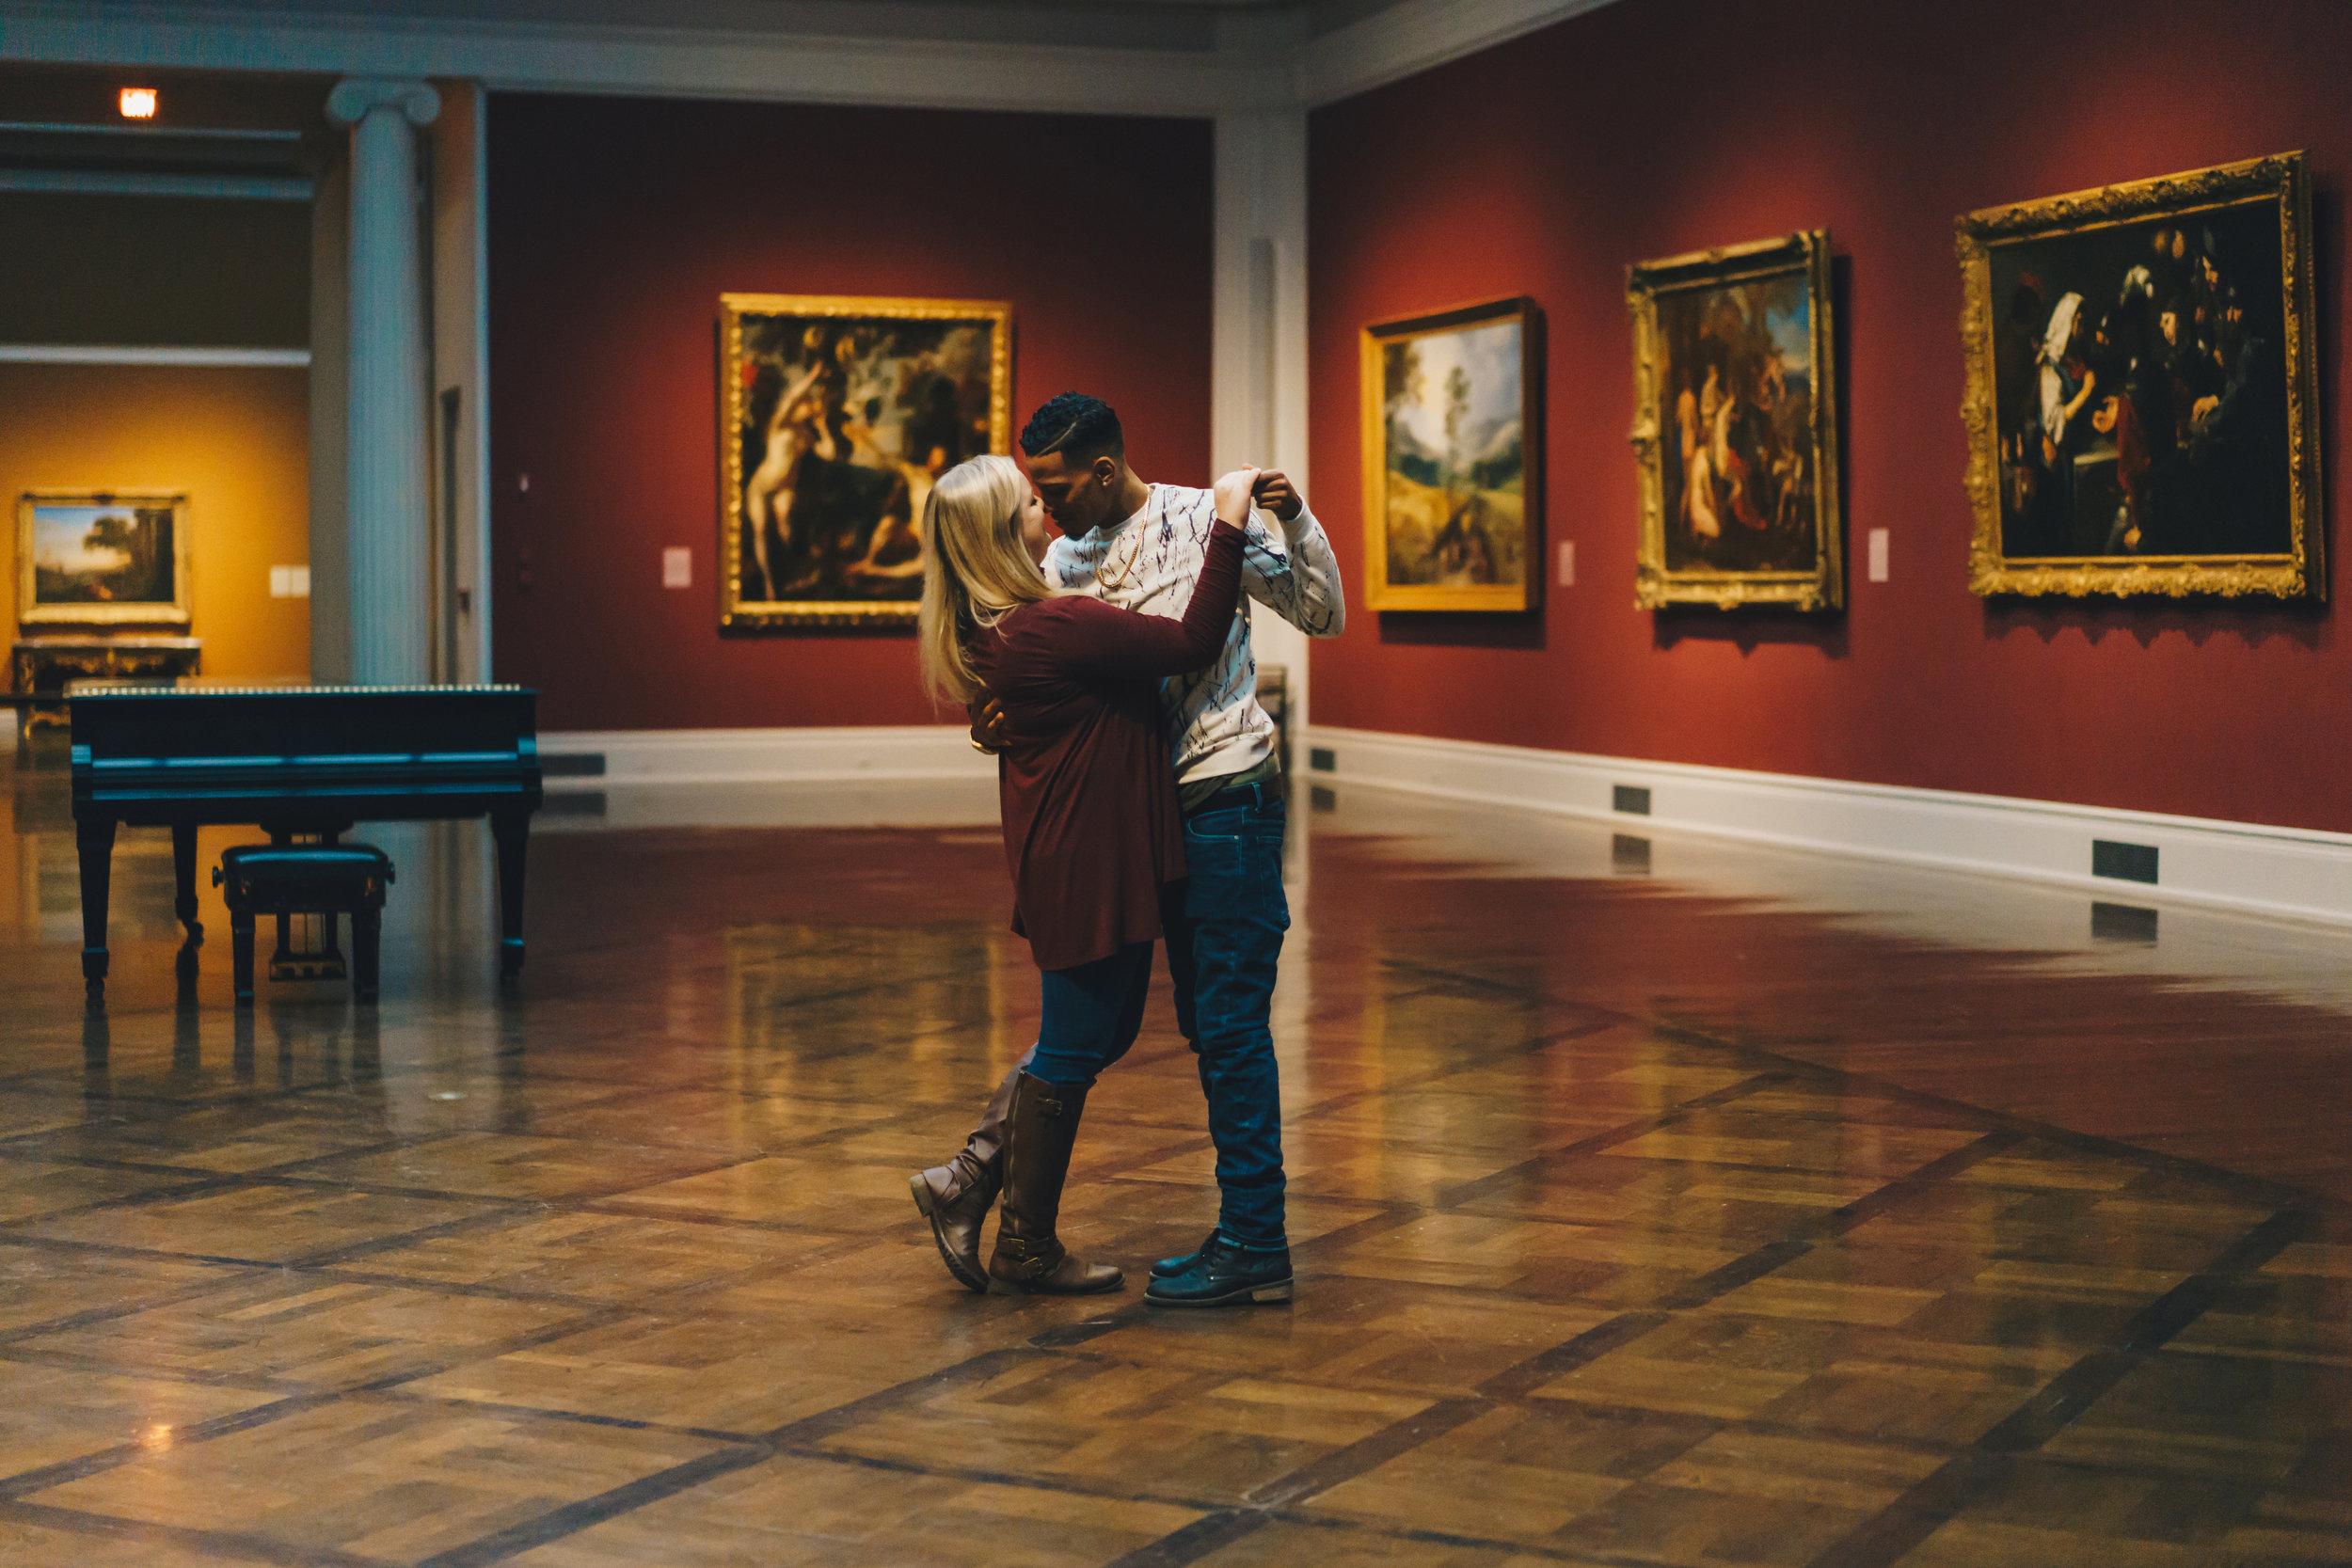 Nashville Tennessee Photographer- Art Museum Family Session 11